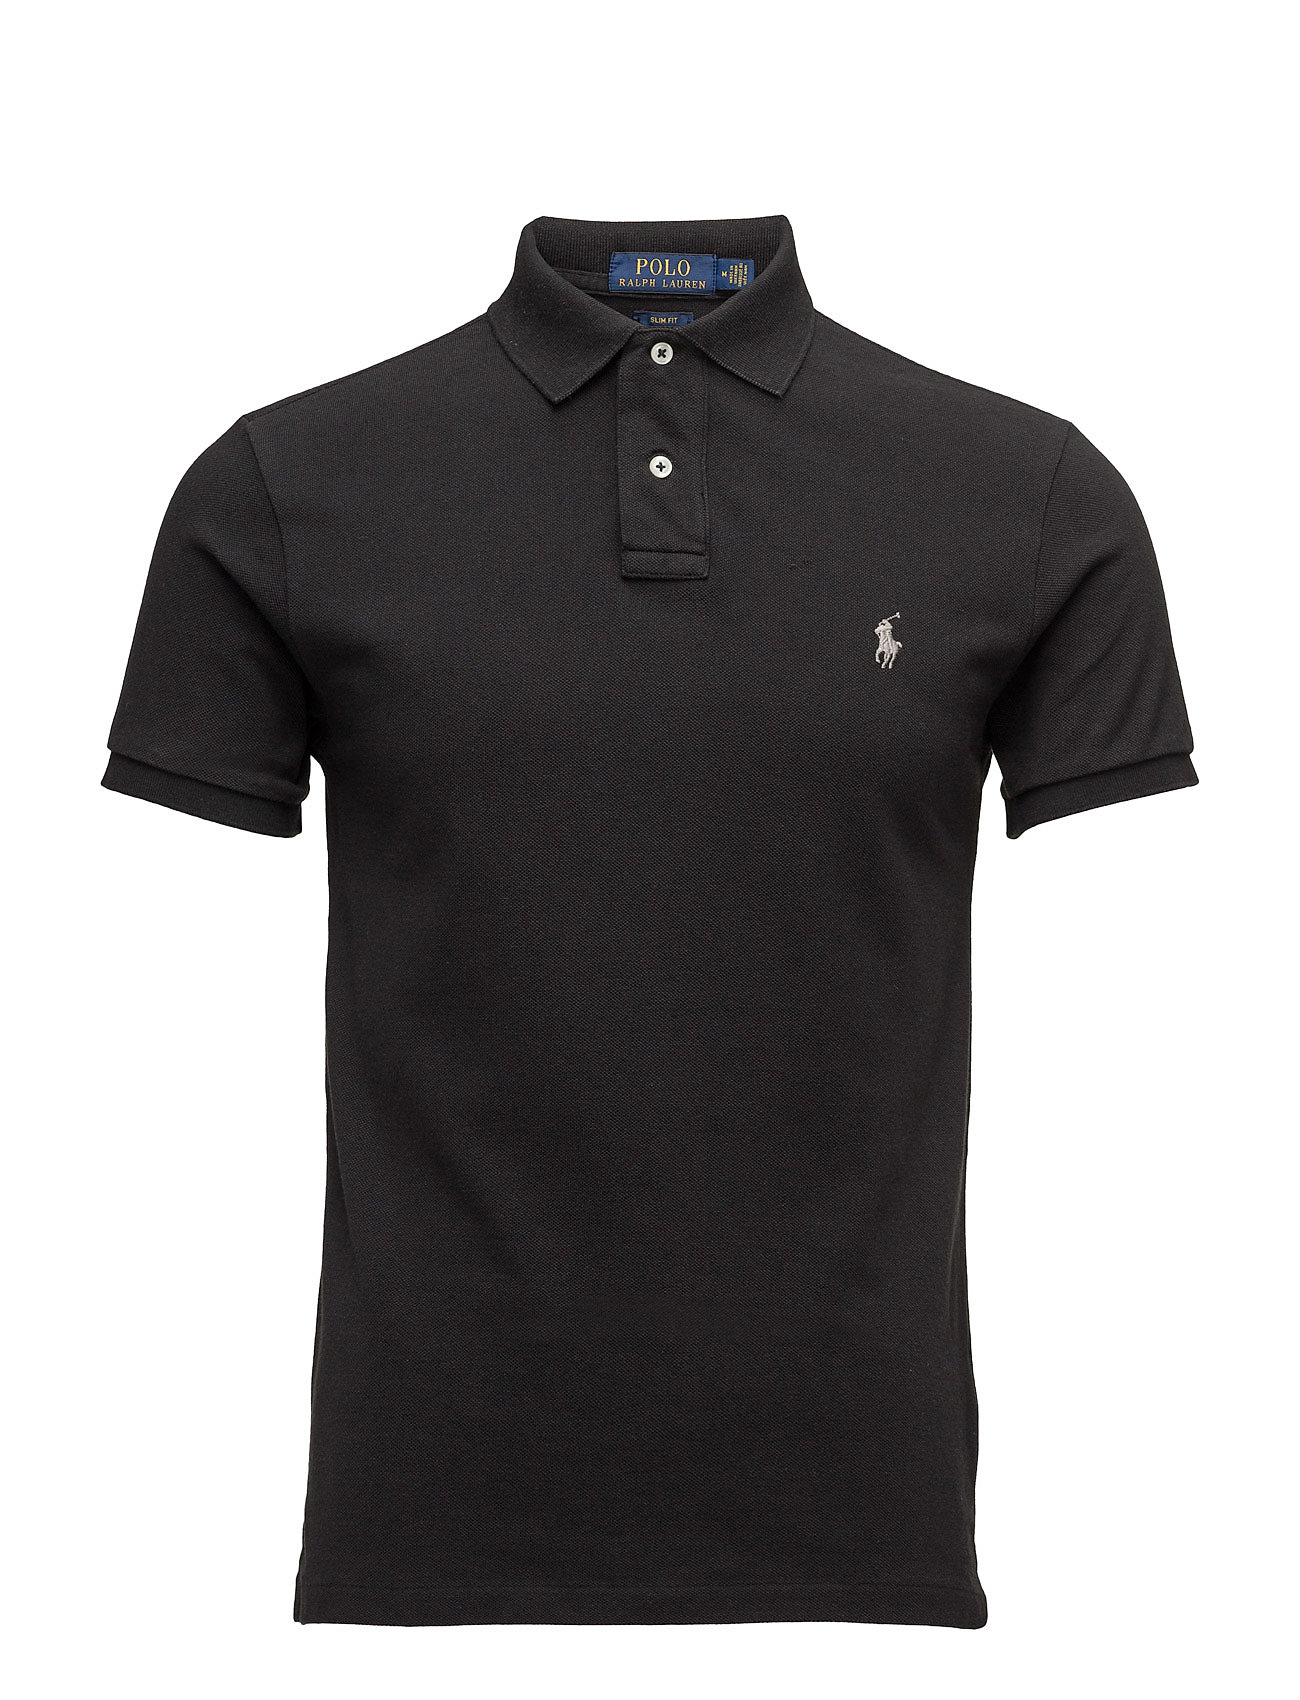 Fit Polo Mesh grey Black PRalph Lauren Shirtpolo Slim RqL5j34cA